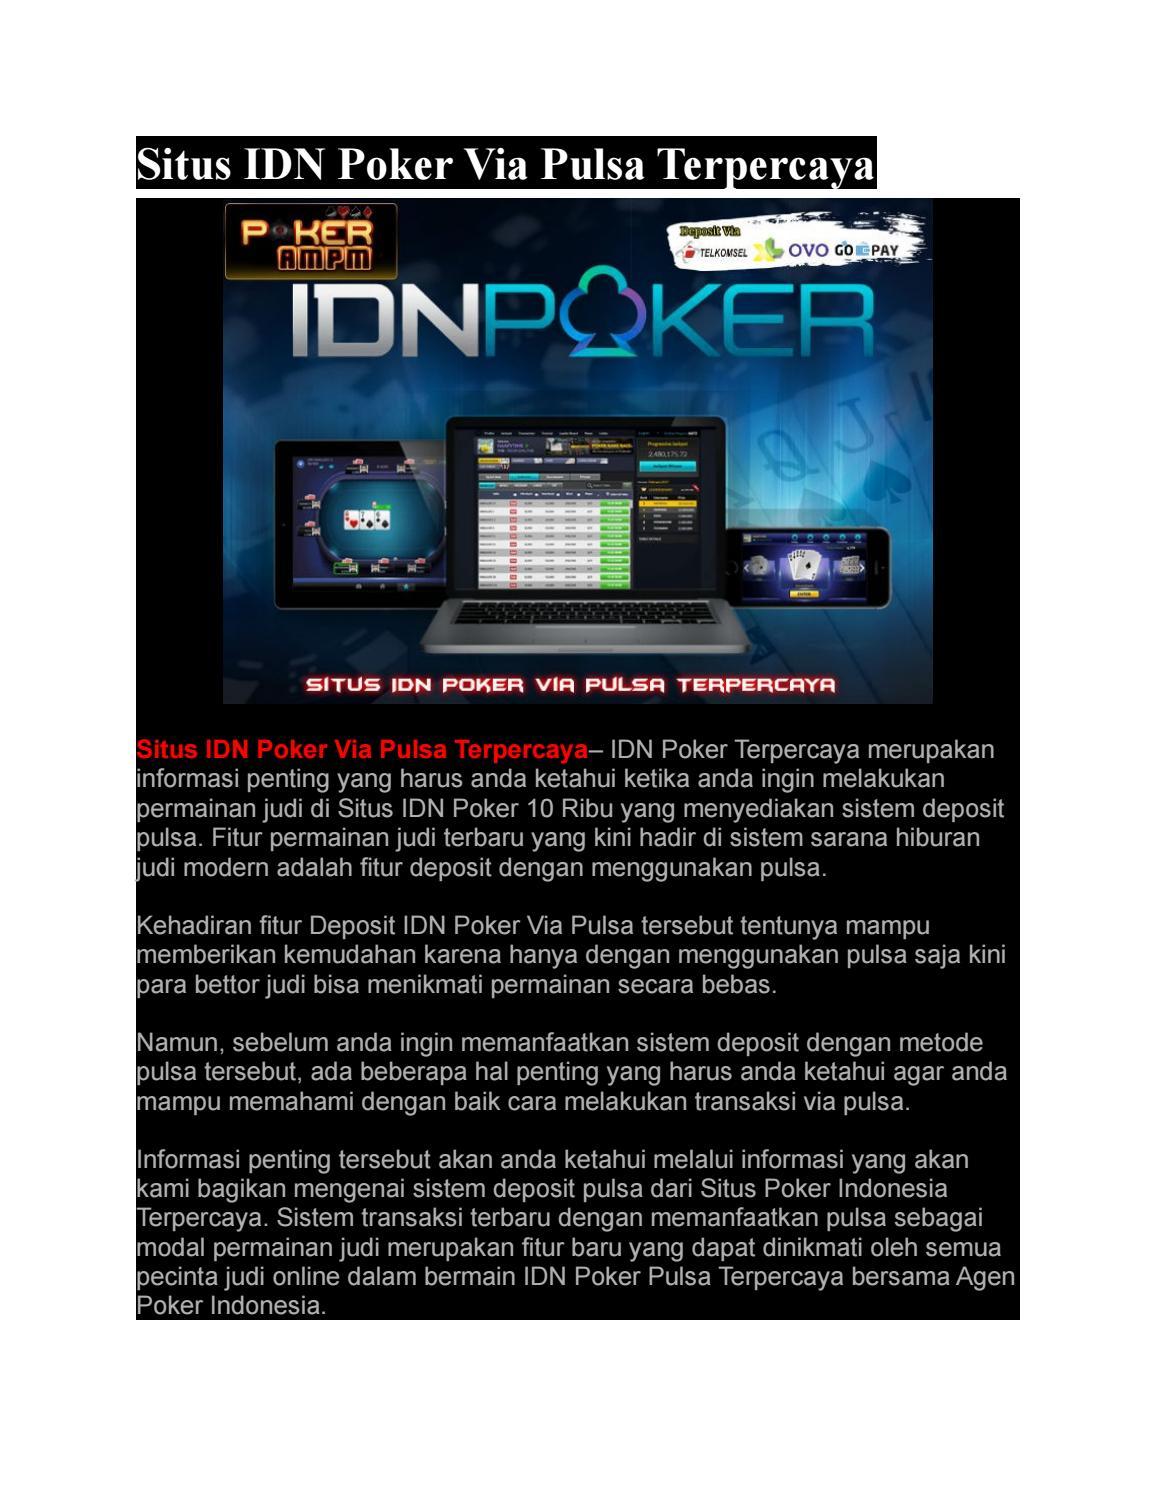 Situs Idn Poker Via Pulsa Terpercaya Pokerampm By Pokerampmm Issuu